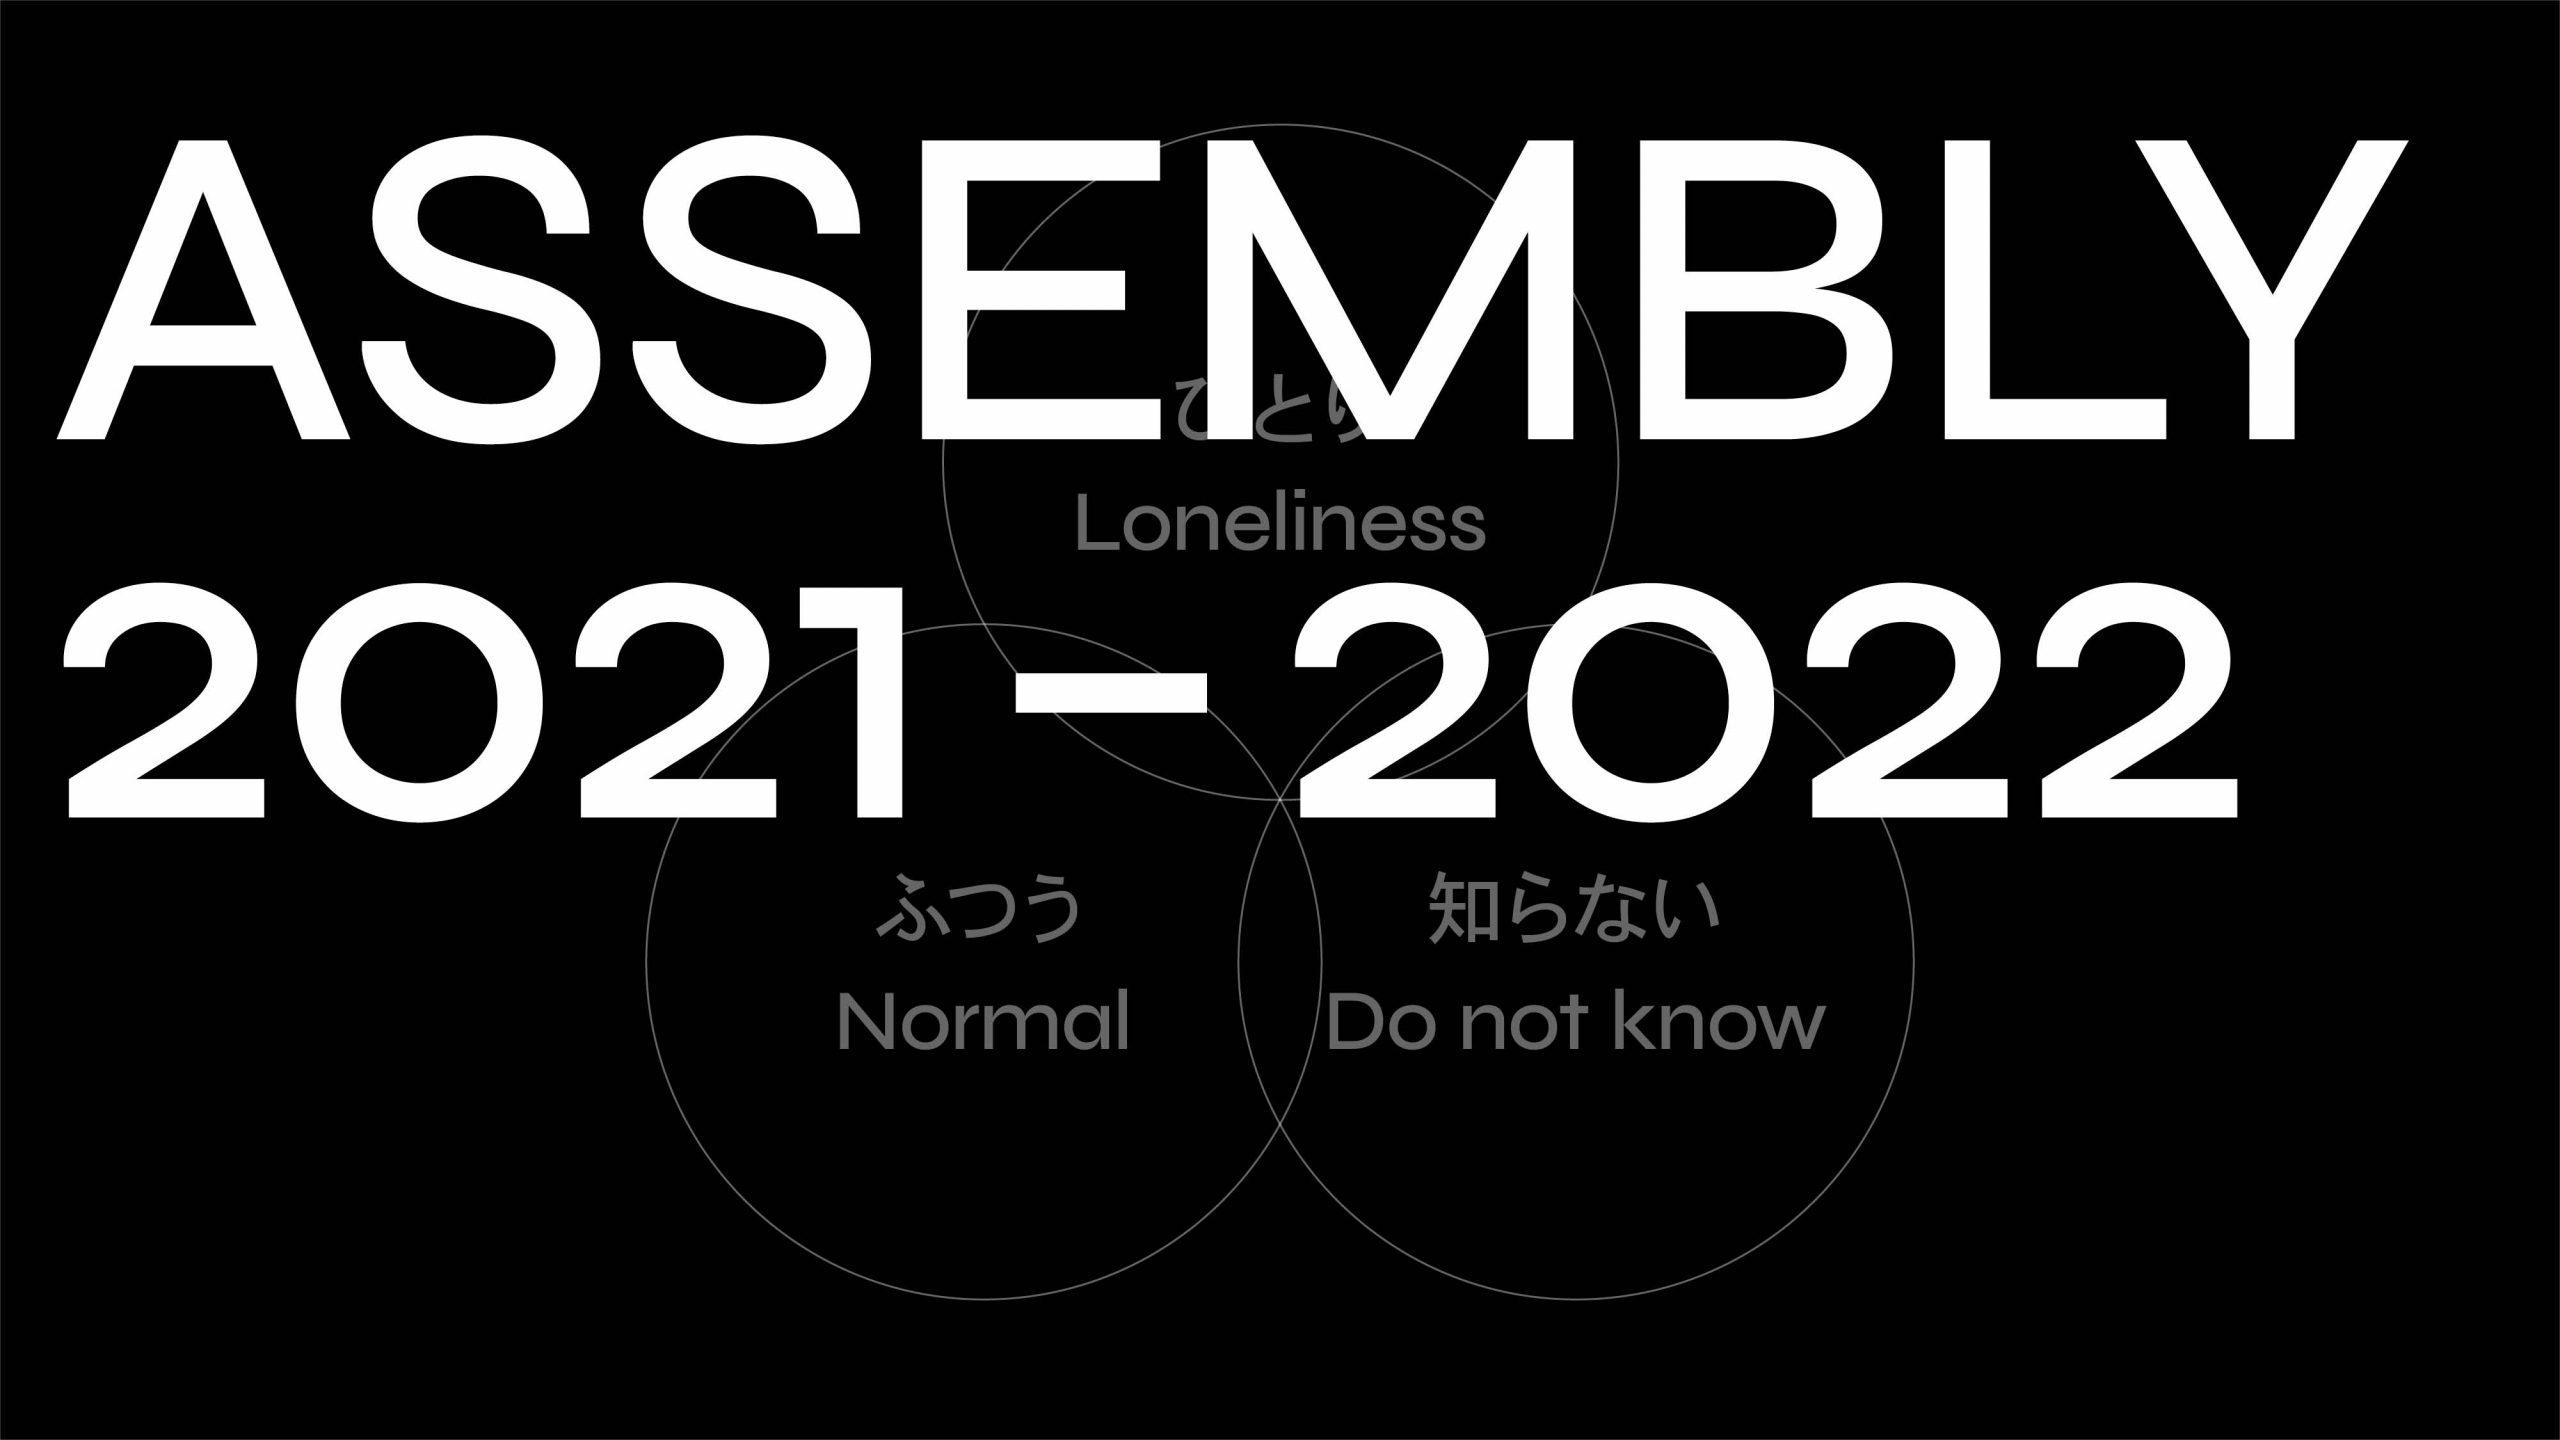 『ASSEMBLY』記事公開スケジュール